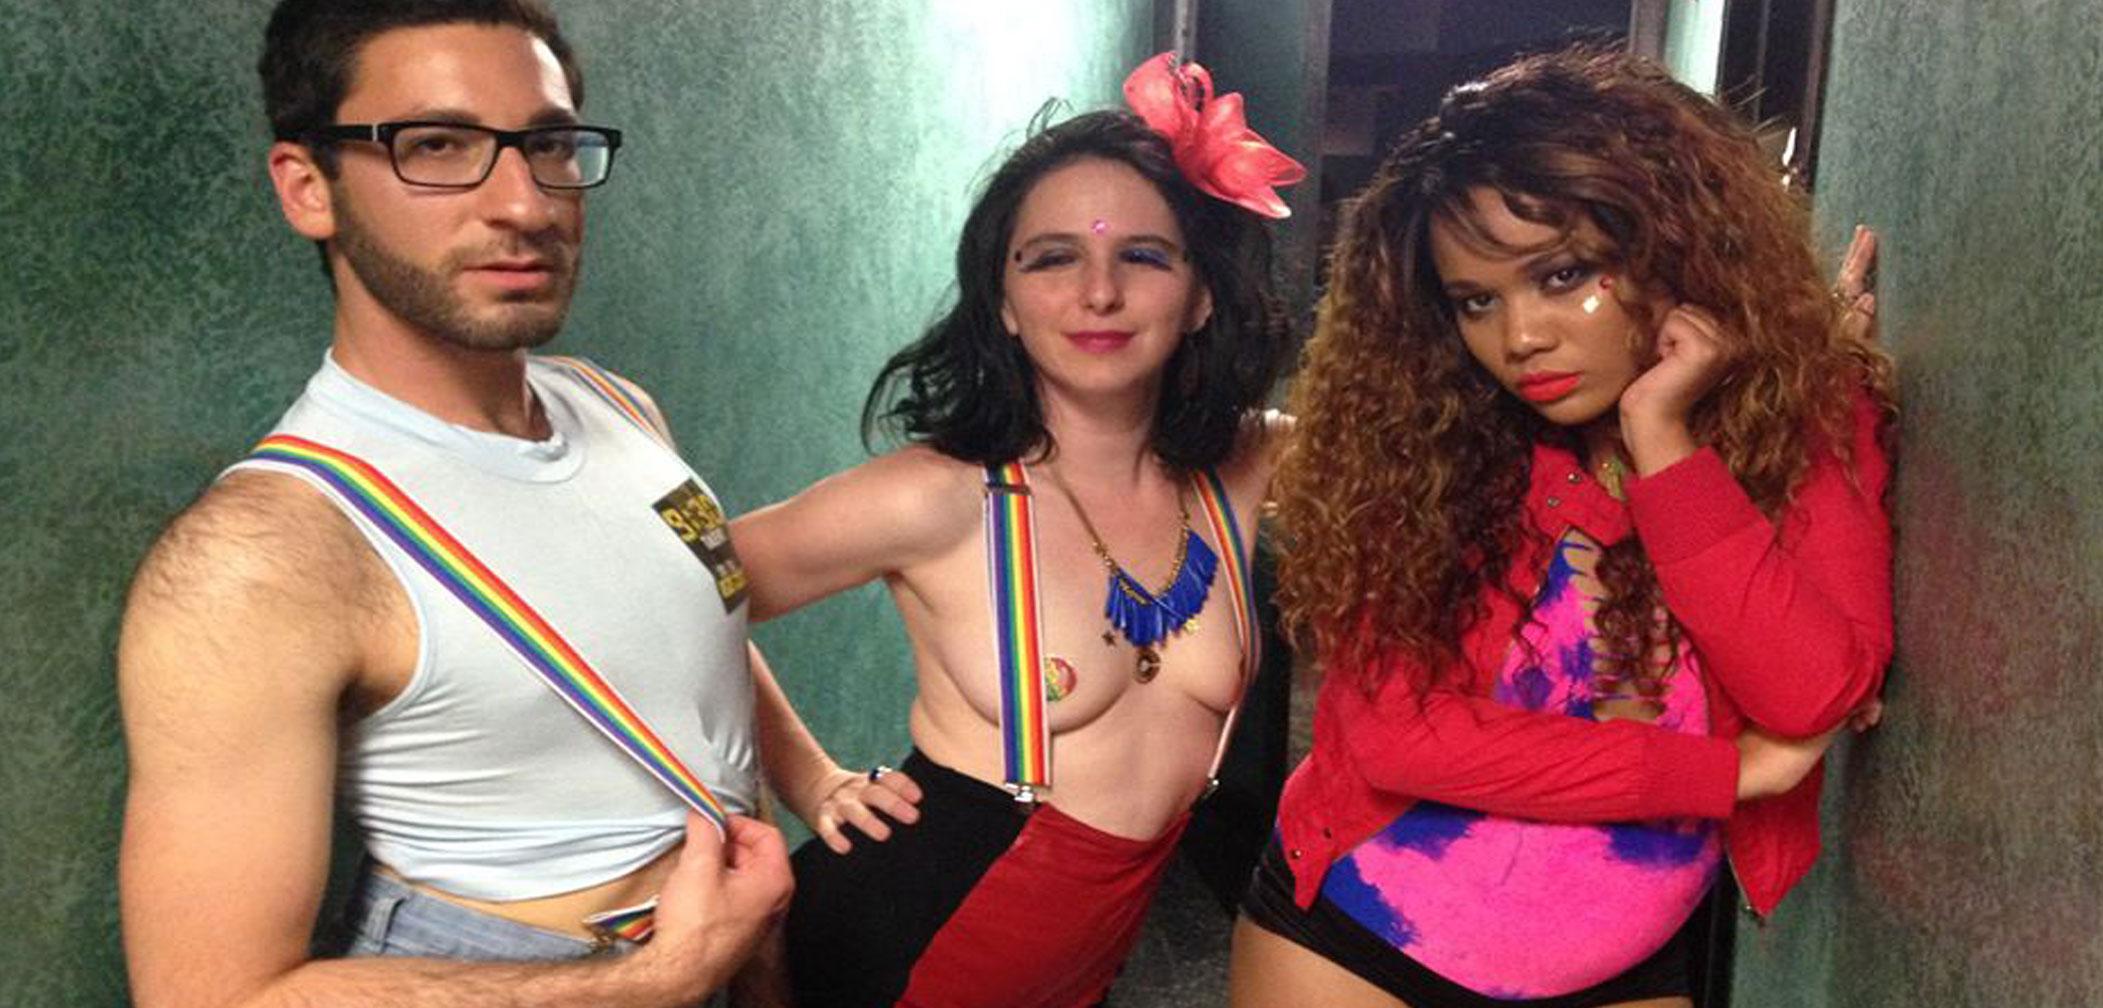 WERK for Peace, LGBTQ, Washington D.C., gay, queer, dancer, man, women, sexy, pasties, rainbow